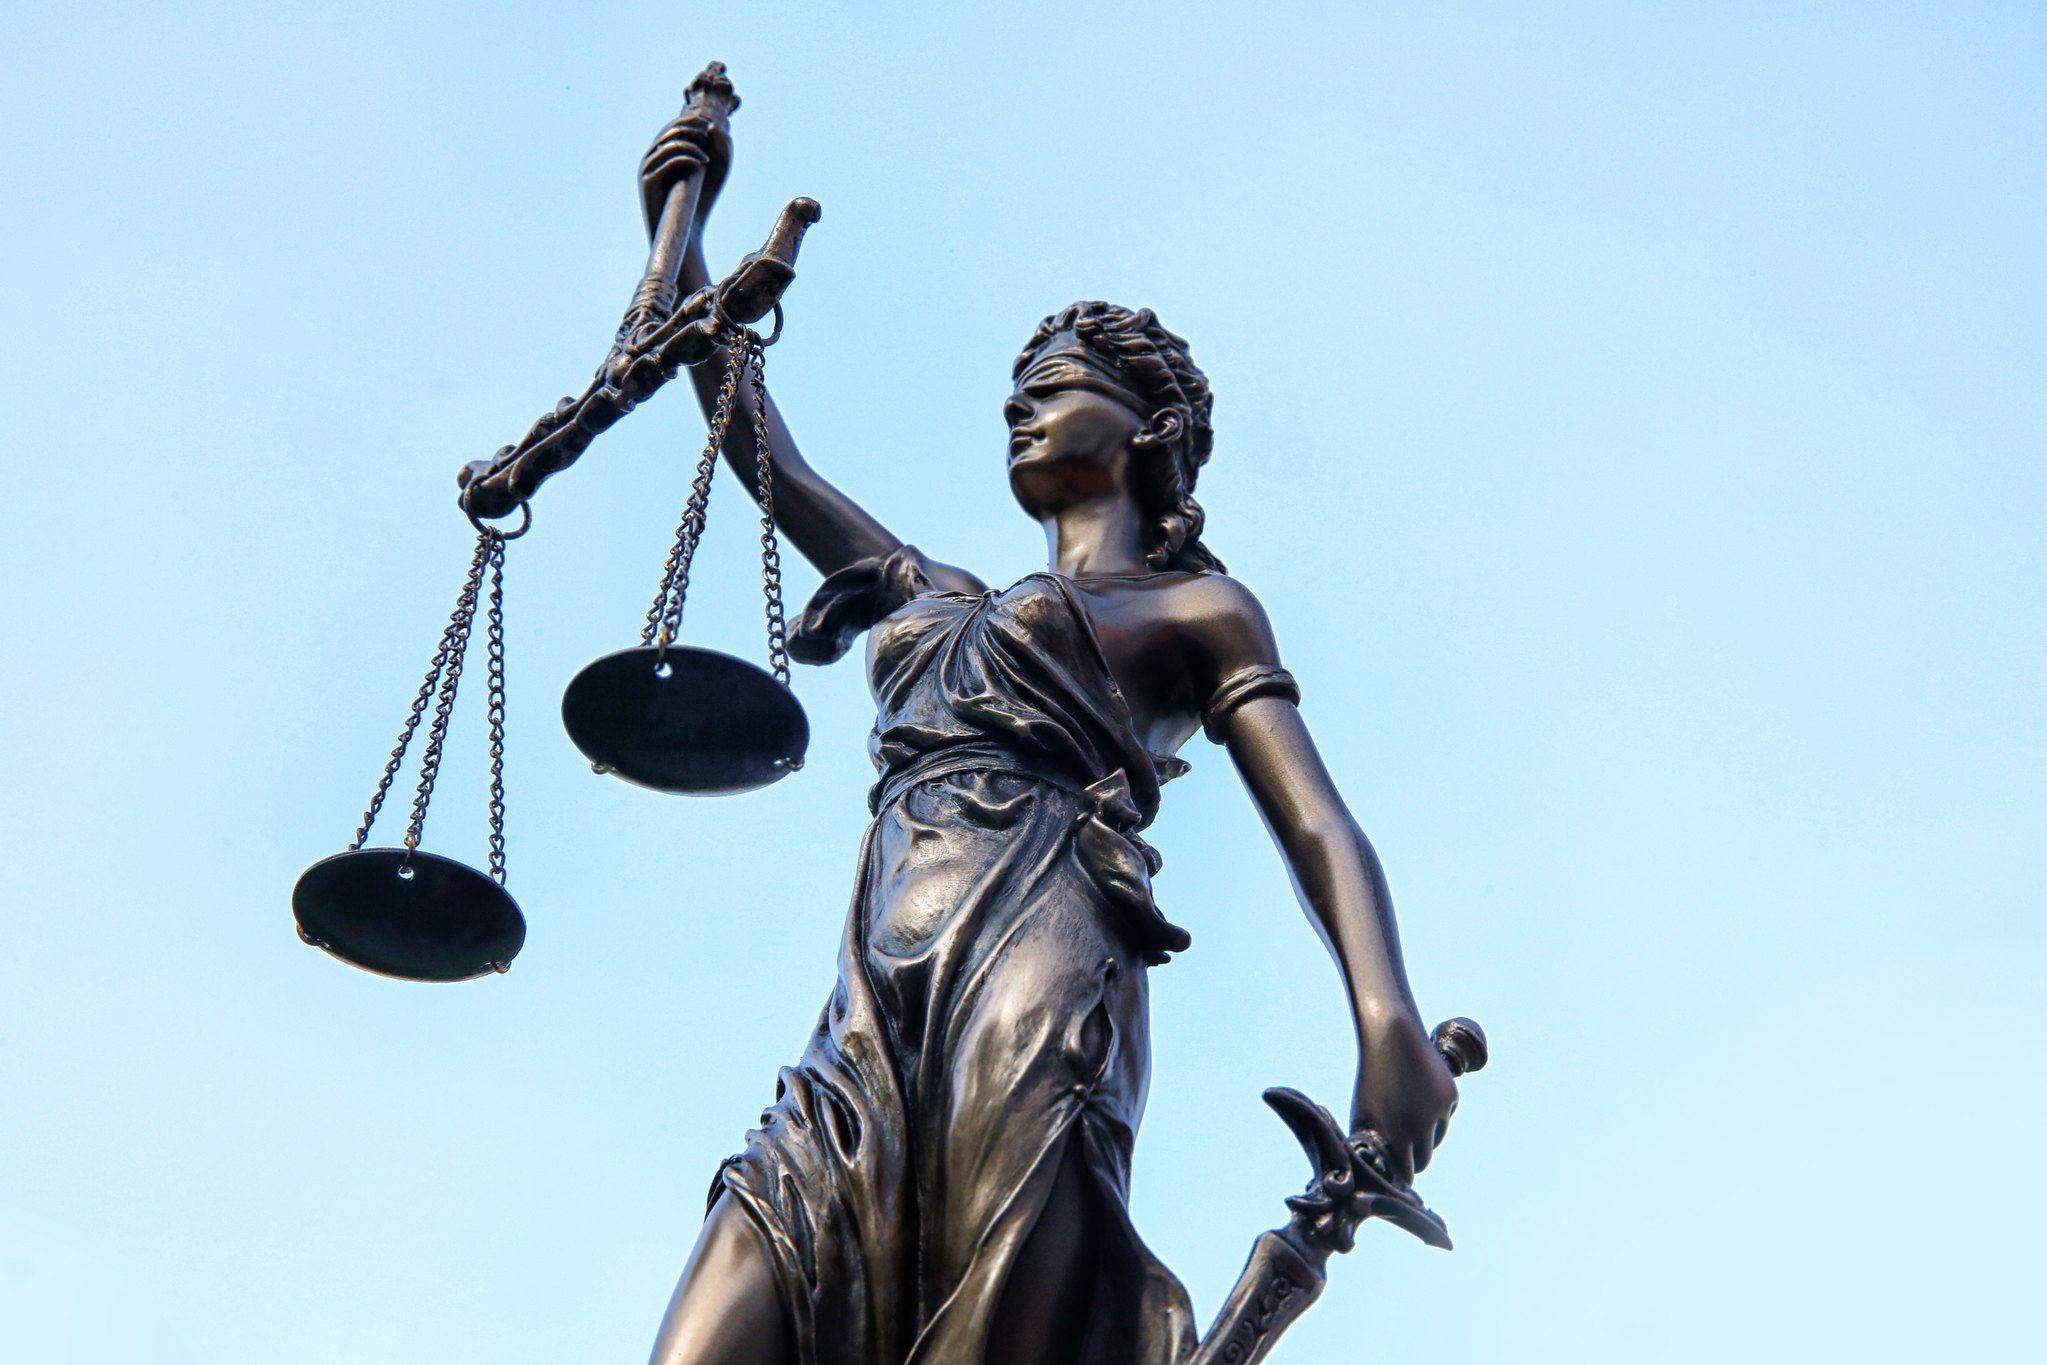 Justizia, Recht, Gesetz